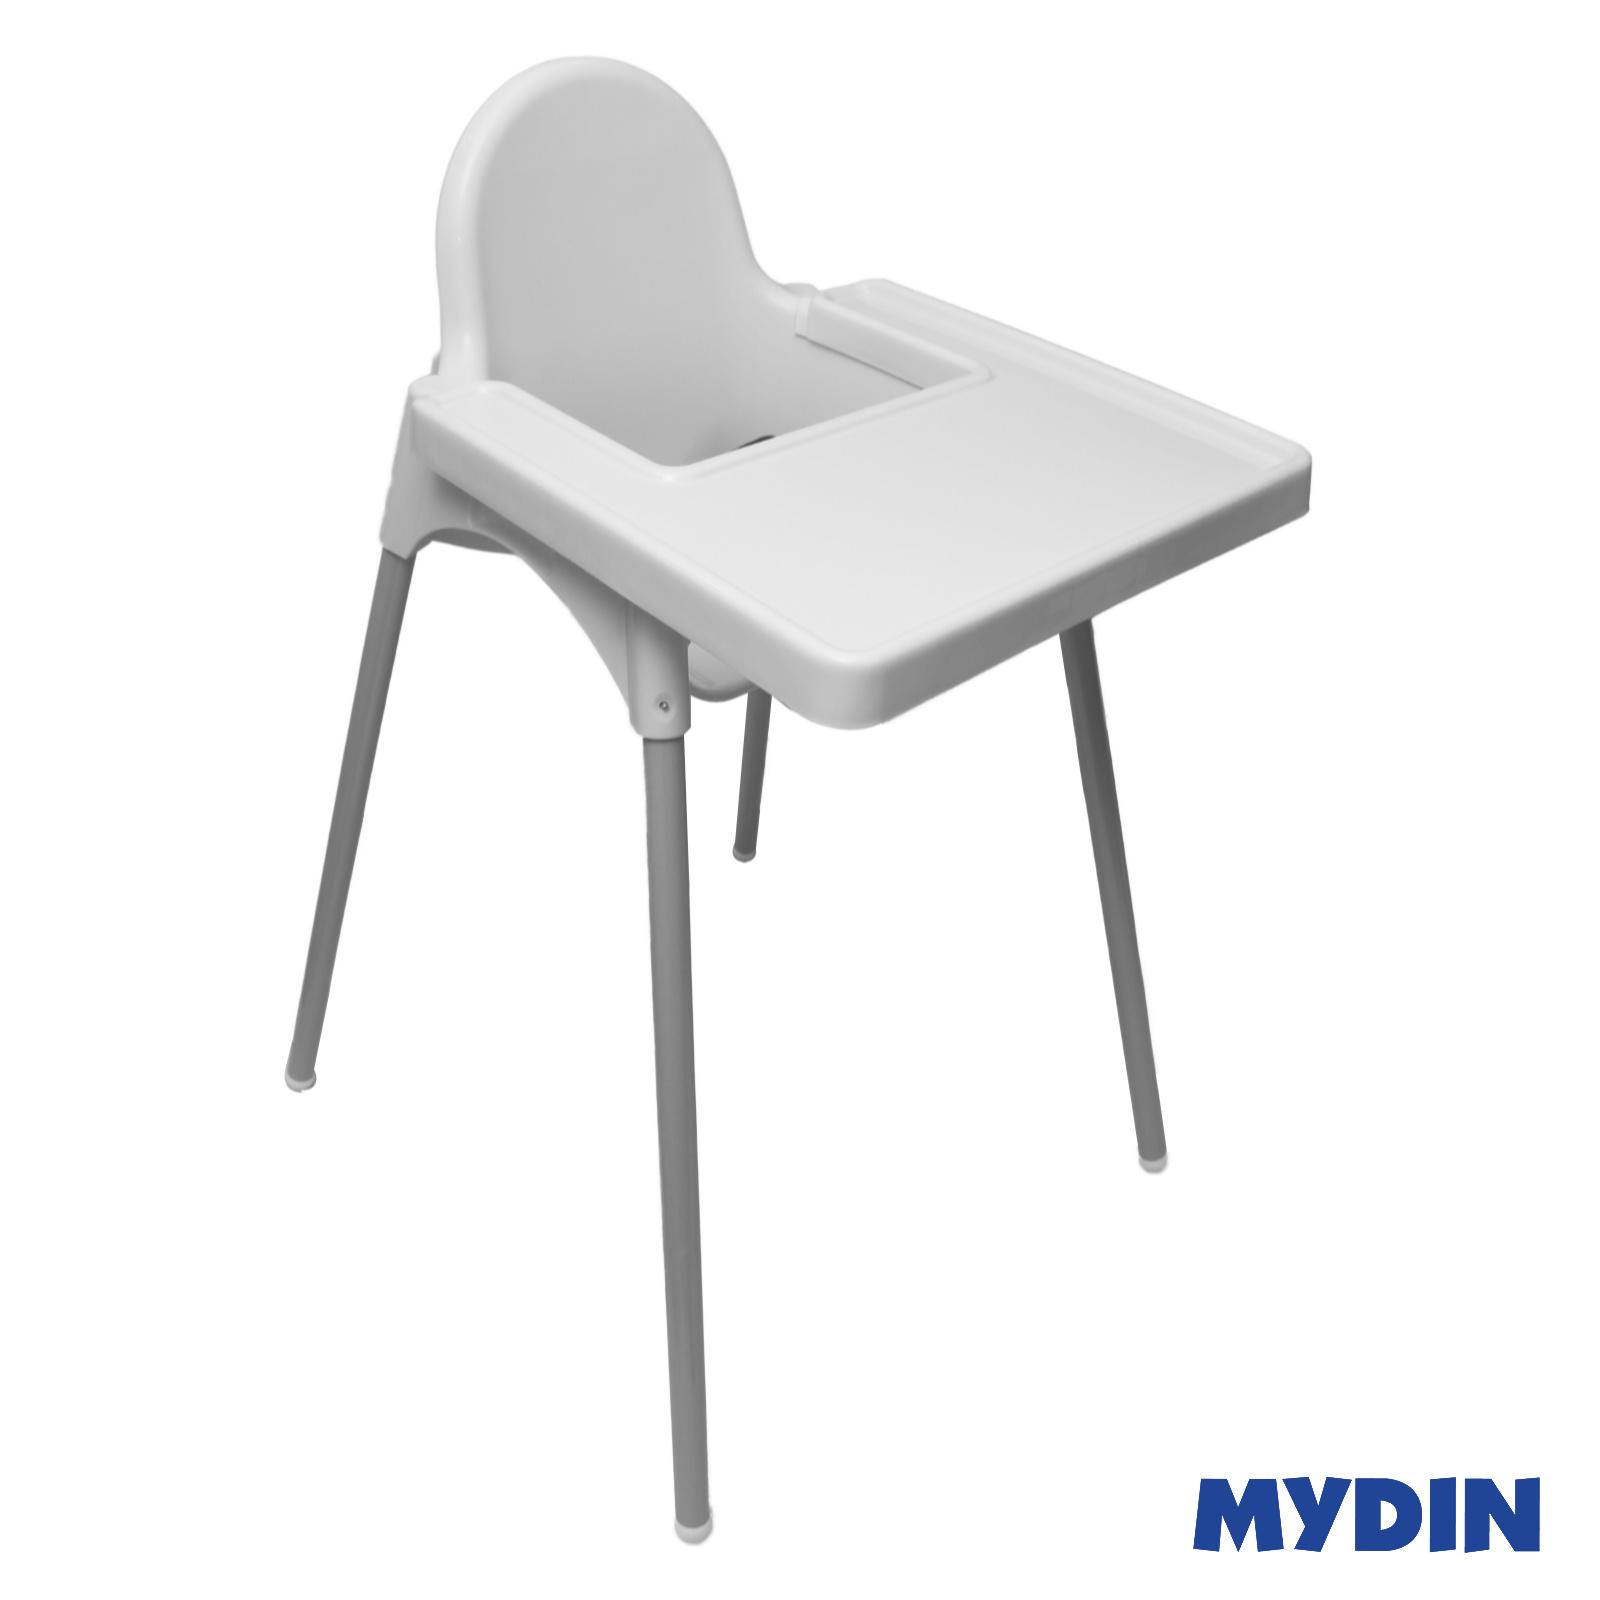 MYBB Portable Baby Feeding Dining Chair White 0820YW-HE02C